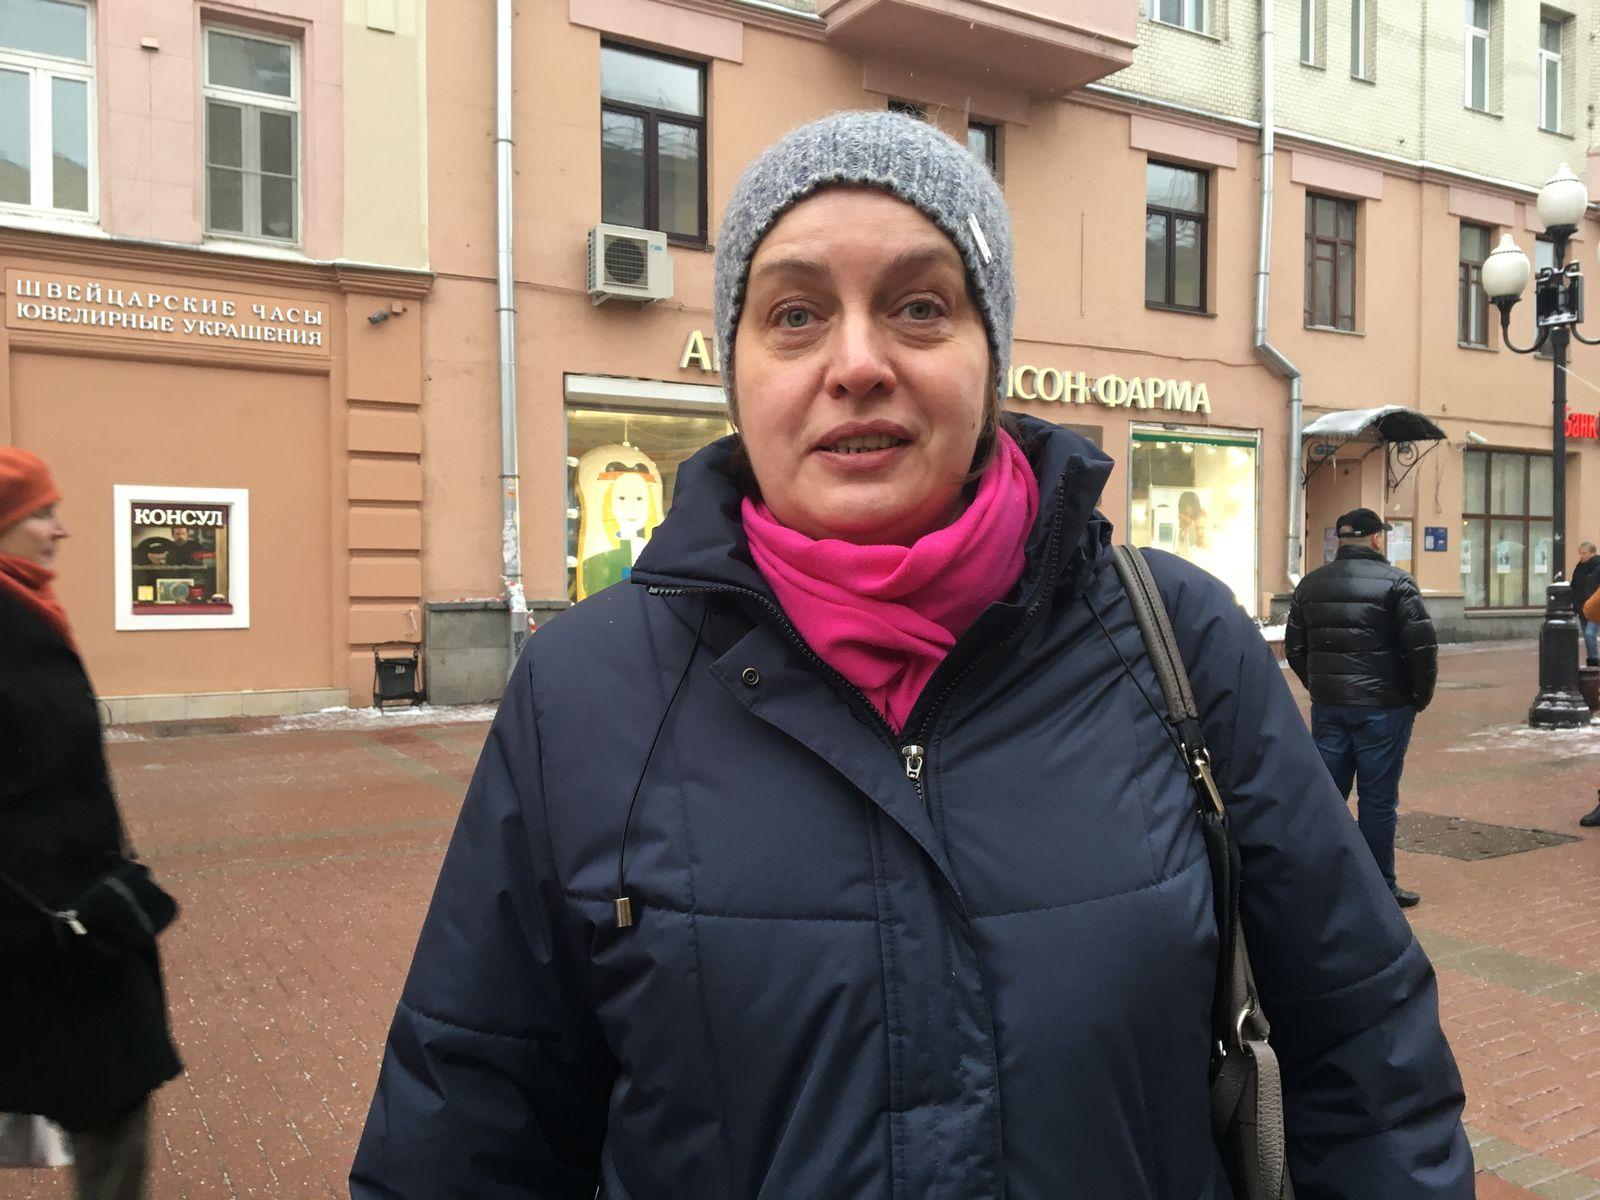 Russland/ Stimmung/ Skripal/ Olga Perschina/ Christina Hebel